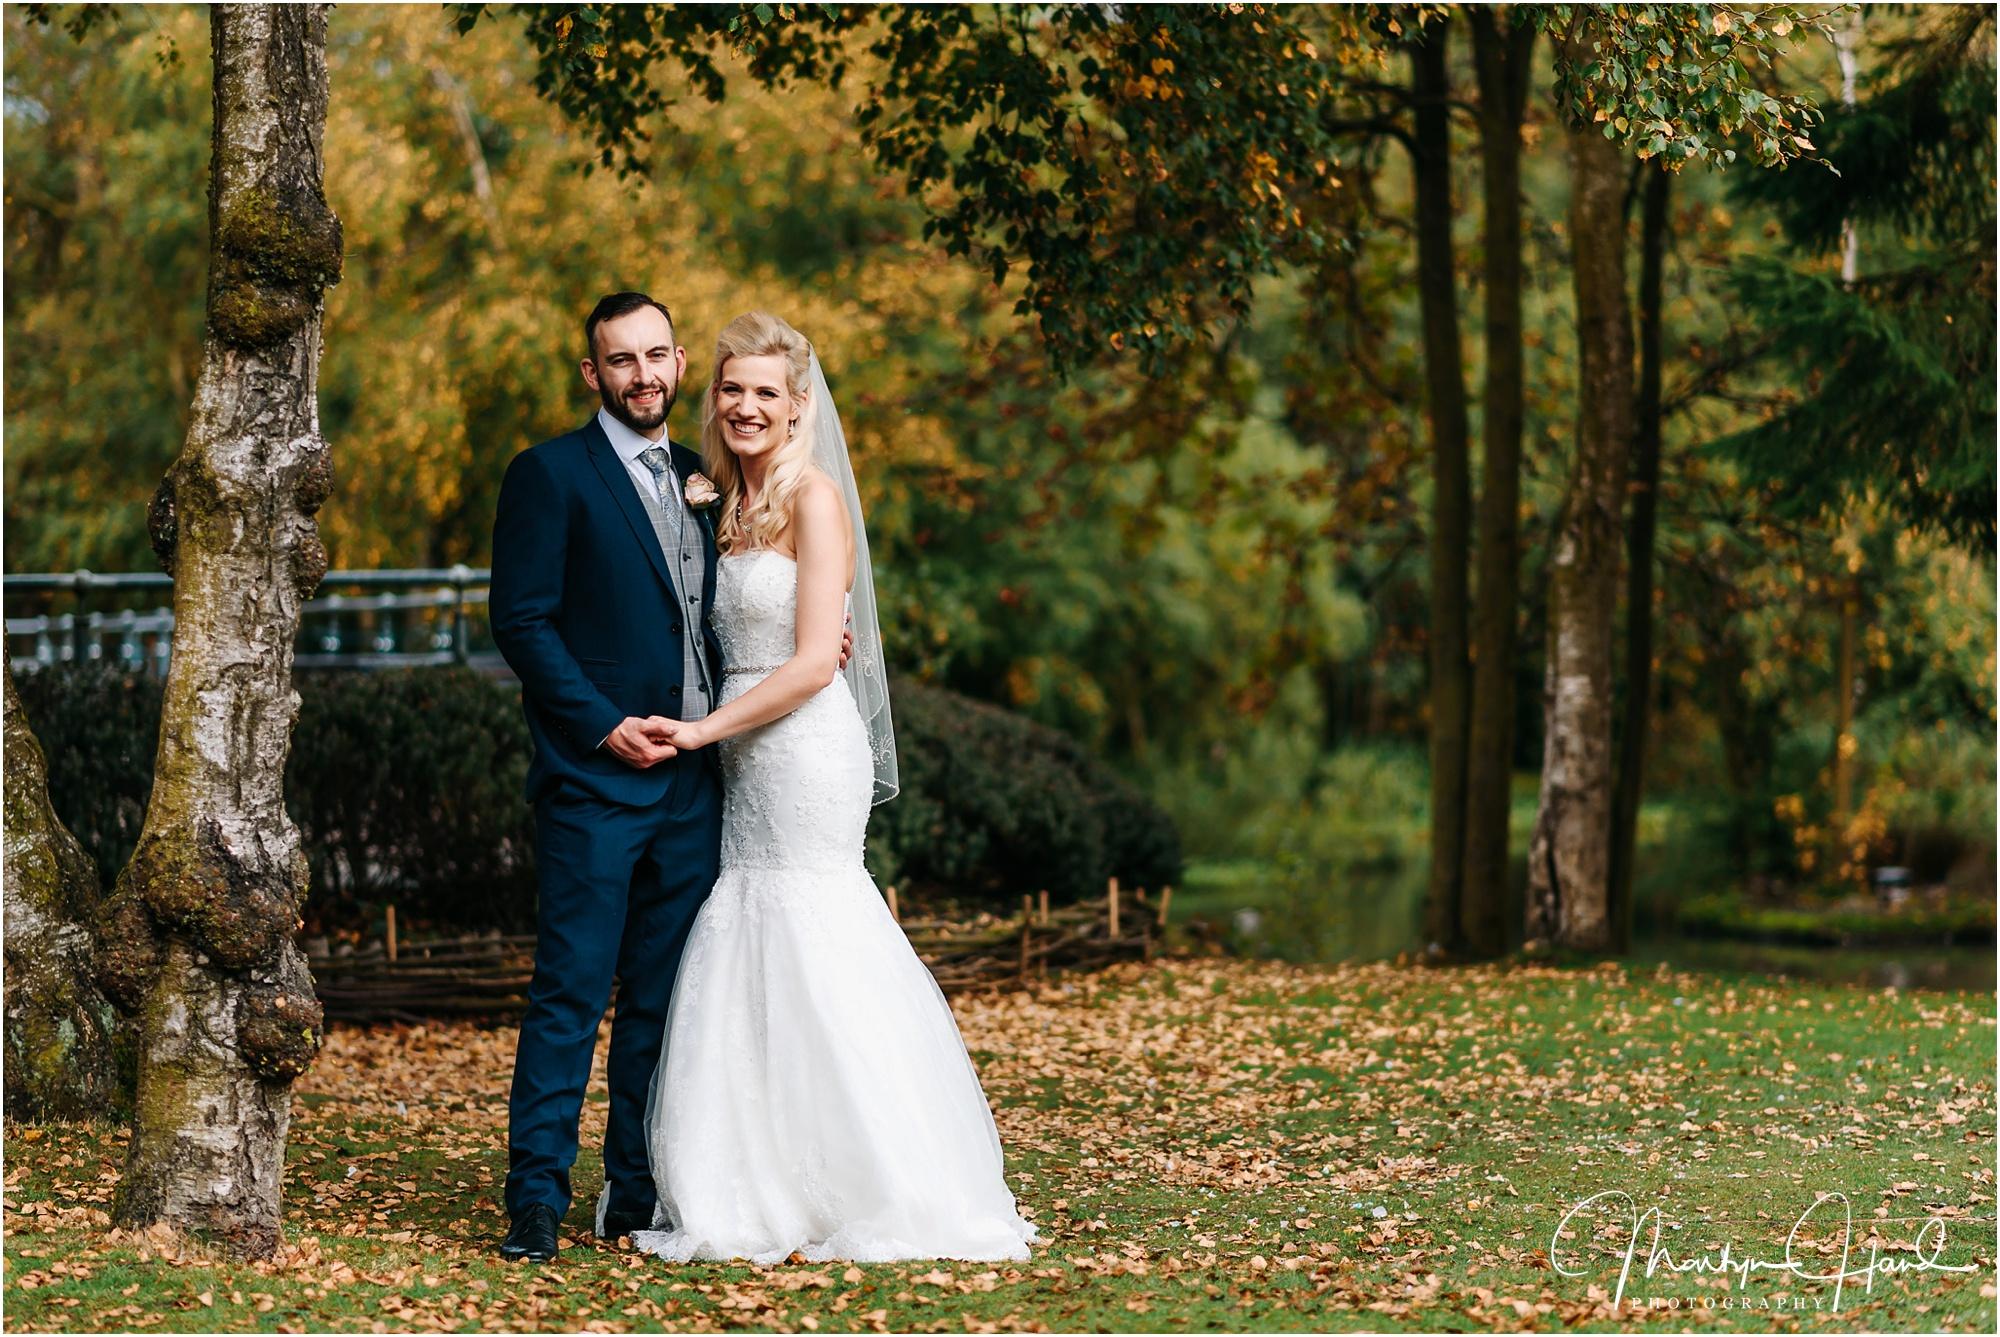 Hayley & Matthew - Blog Highlights_0056.jpg